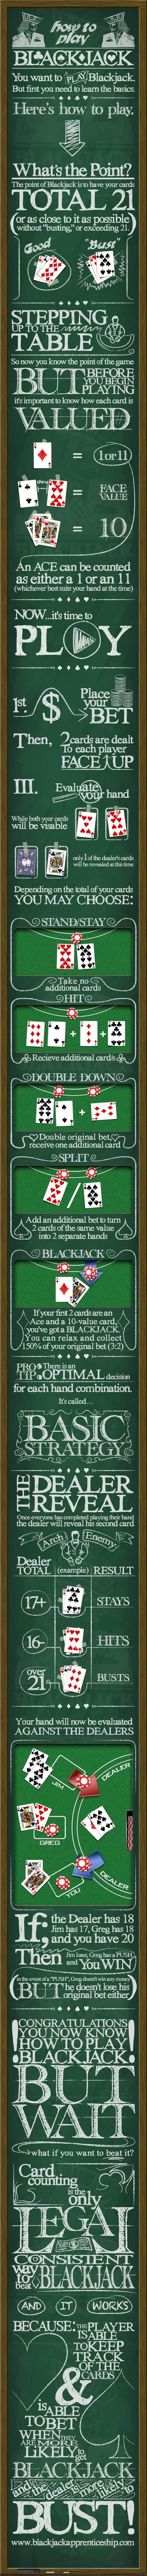 How to play BlackJack...